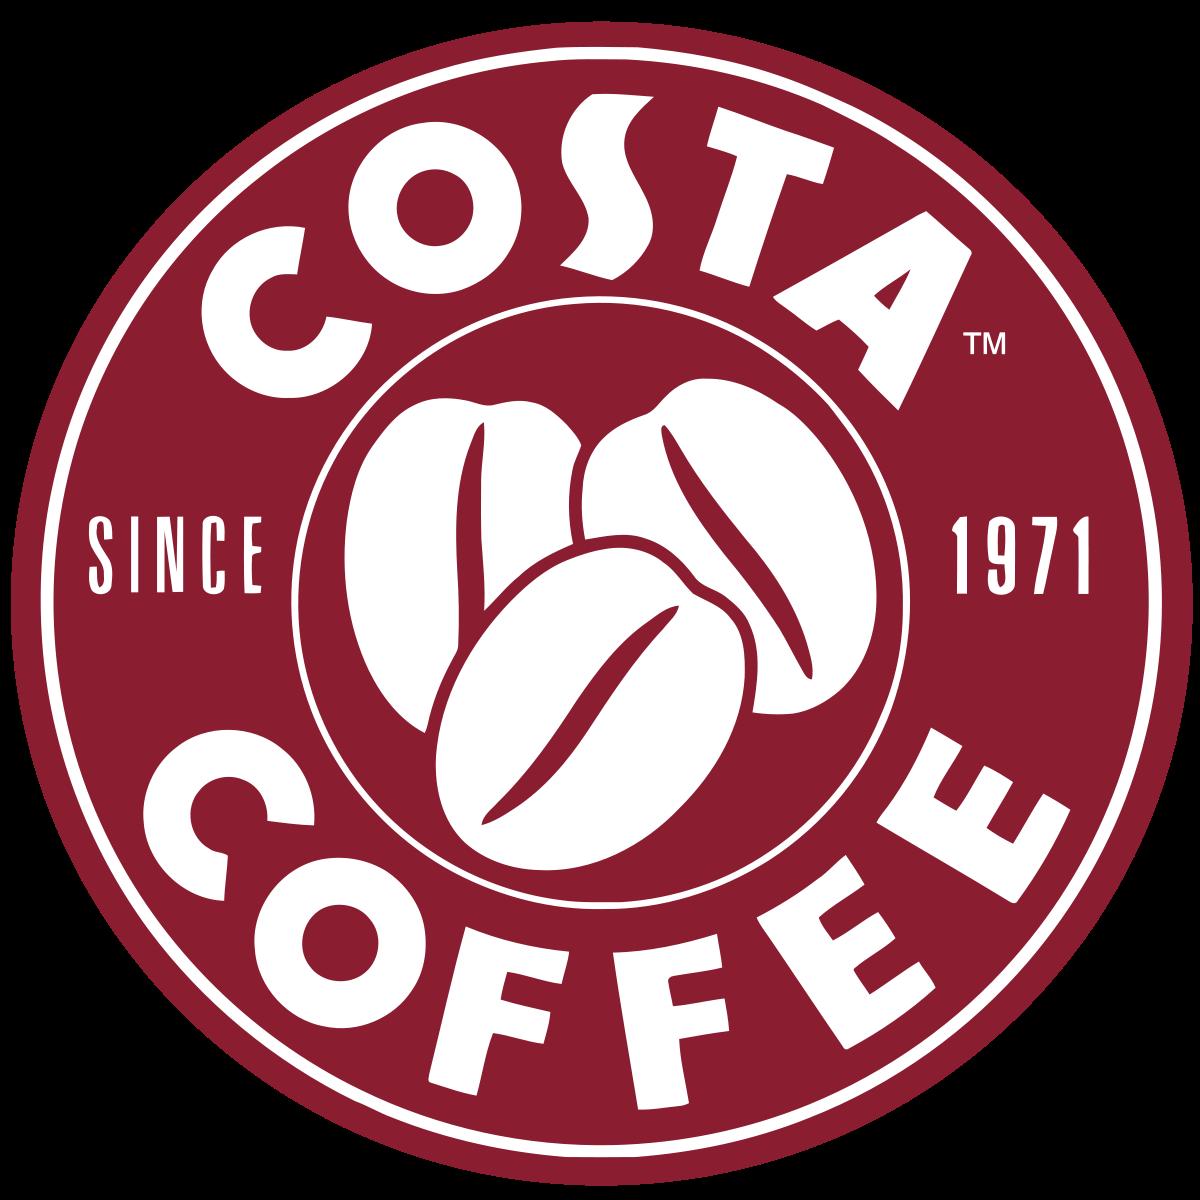 Costa Coffee